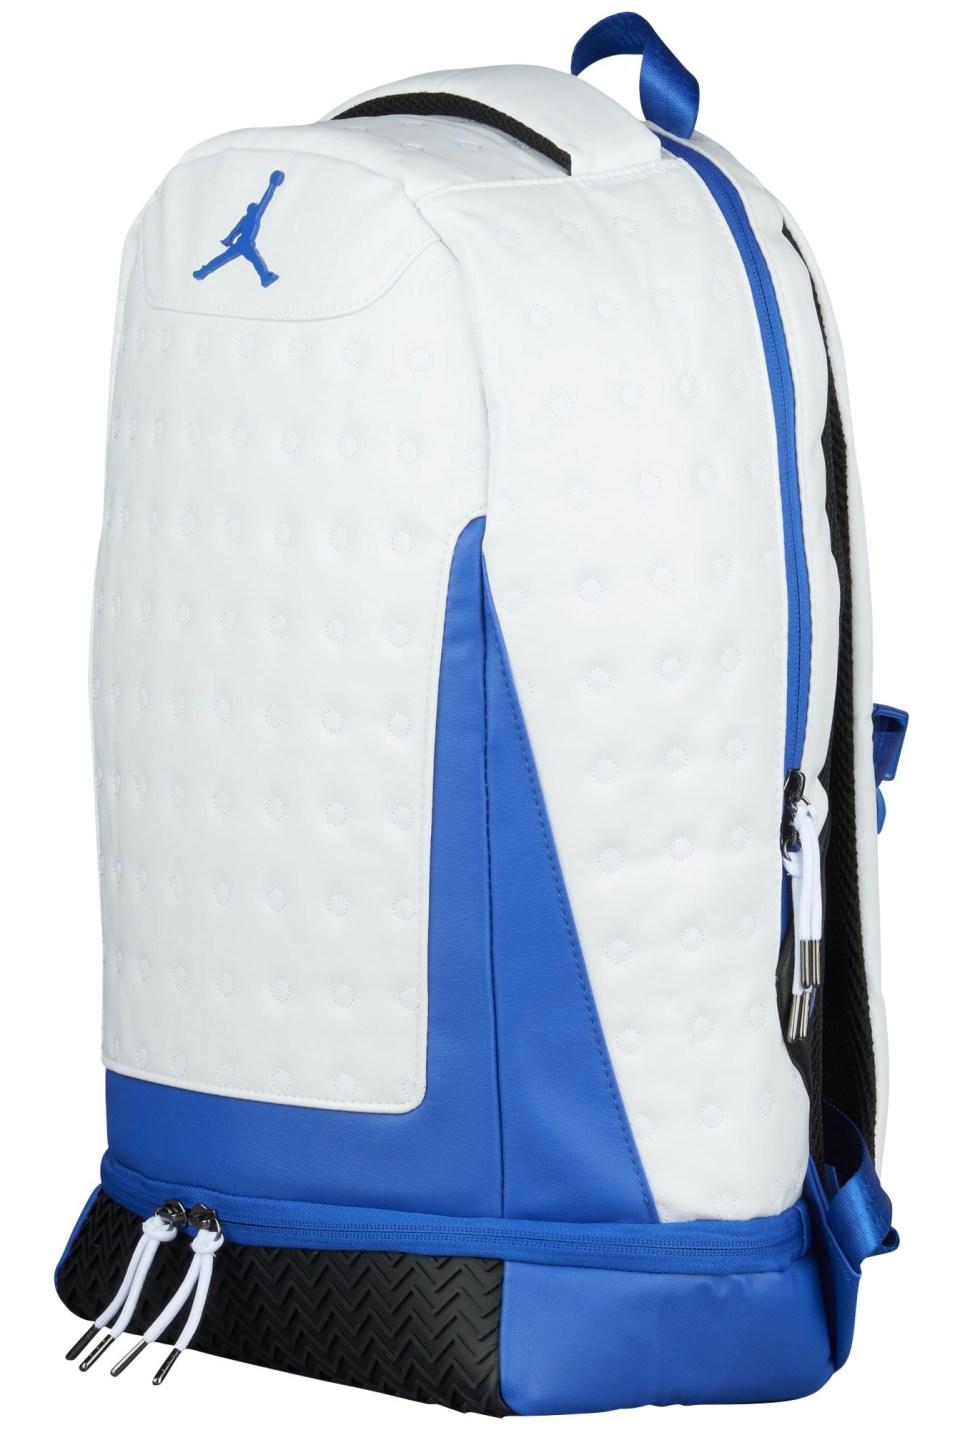 3d524015f1da Jordan Gym Bag Champs